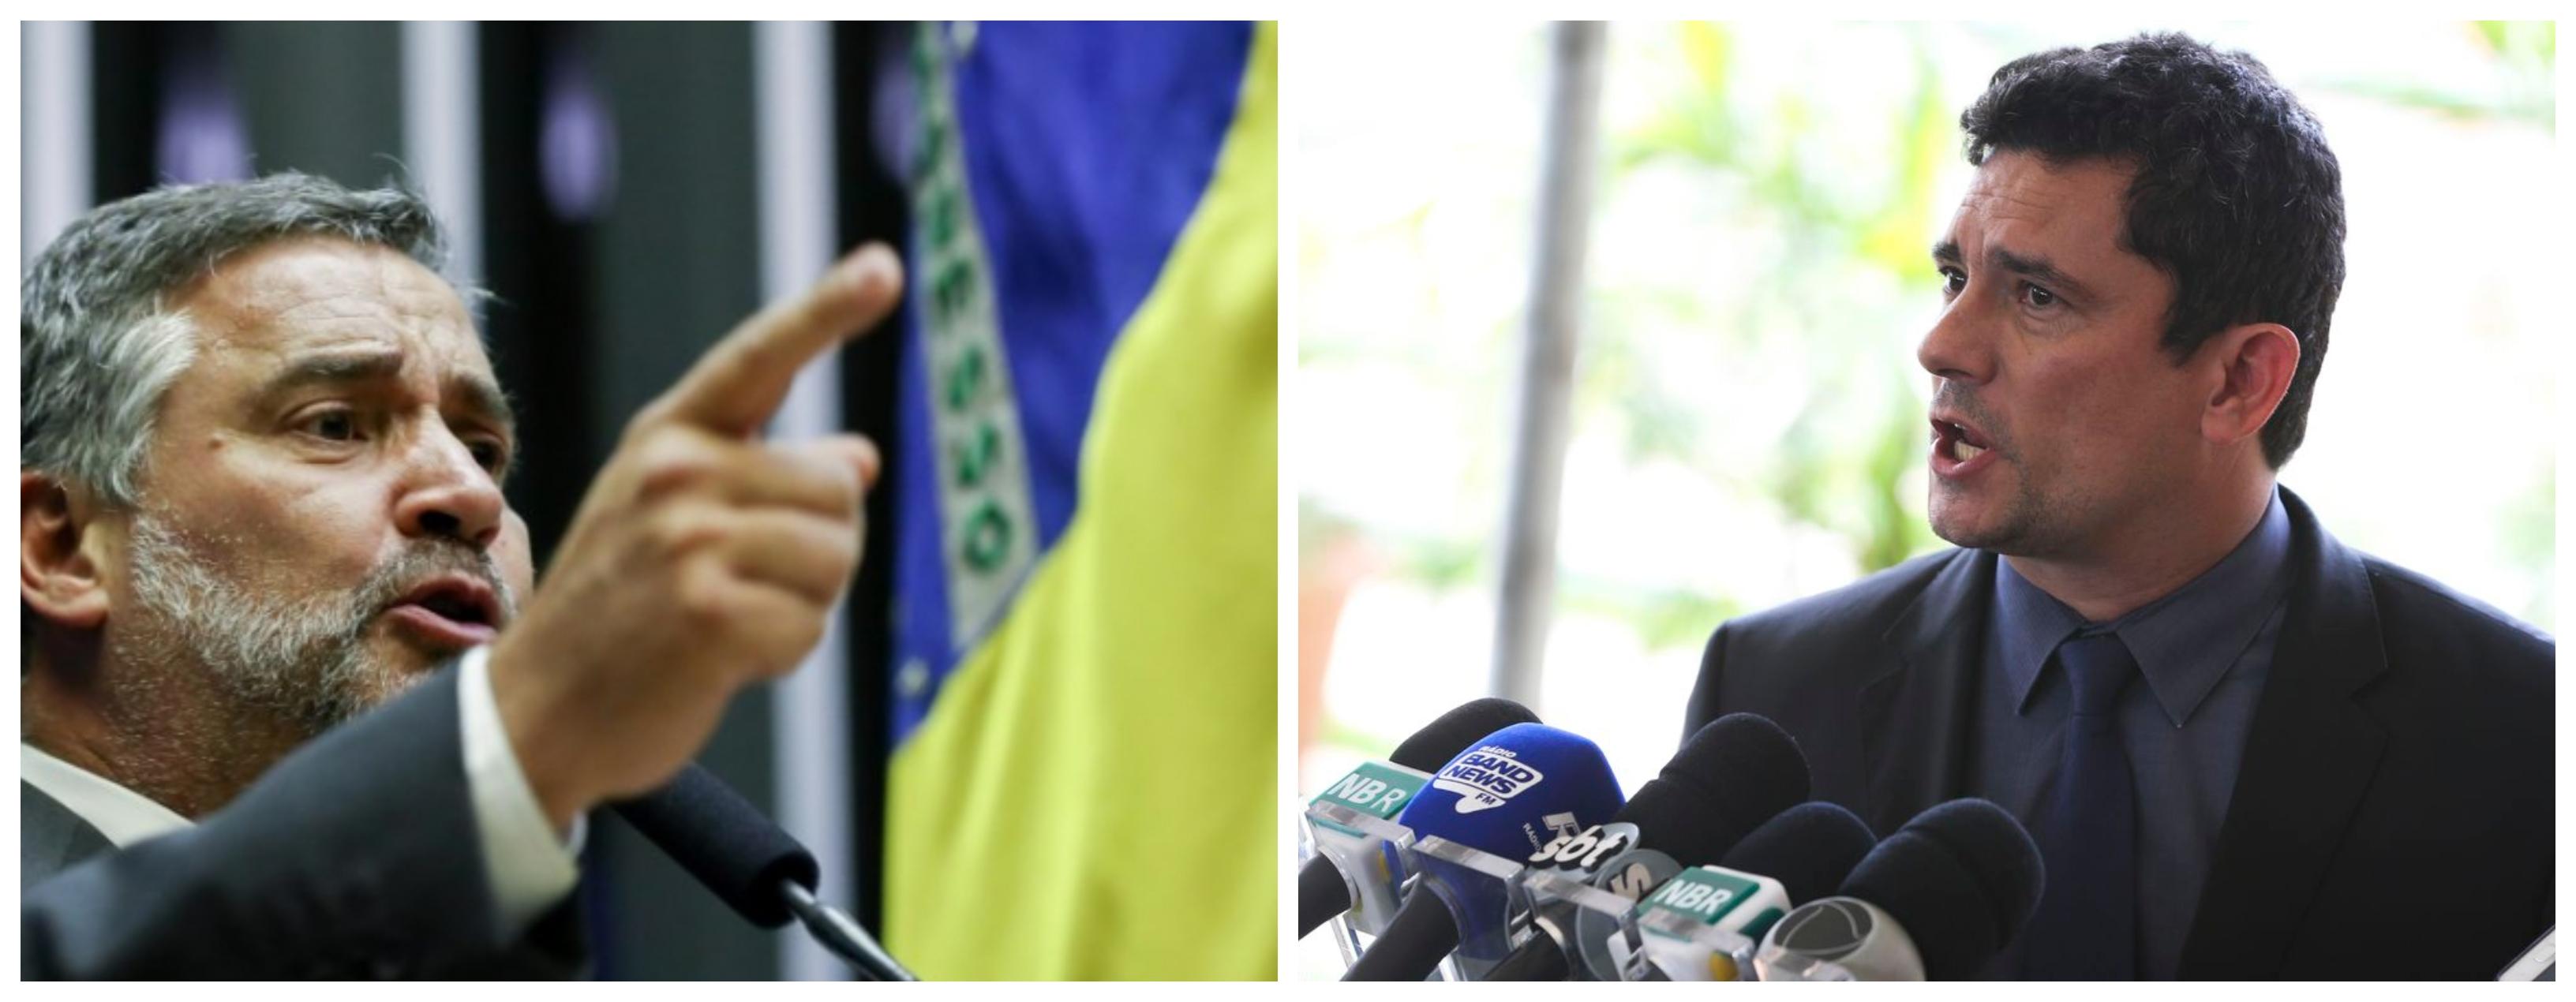 Pimenta desafia Sérgio Moro: E aí, vai investigar o escândalo da família Bolsonaro que, a cada dia, tem mais envolvidos? veja vídeos